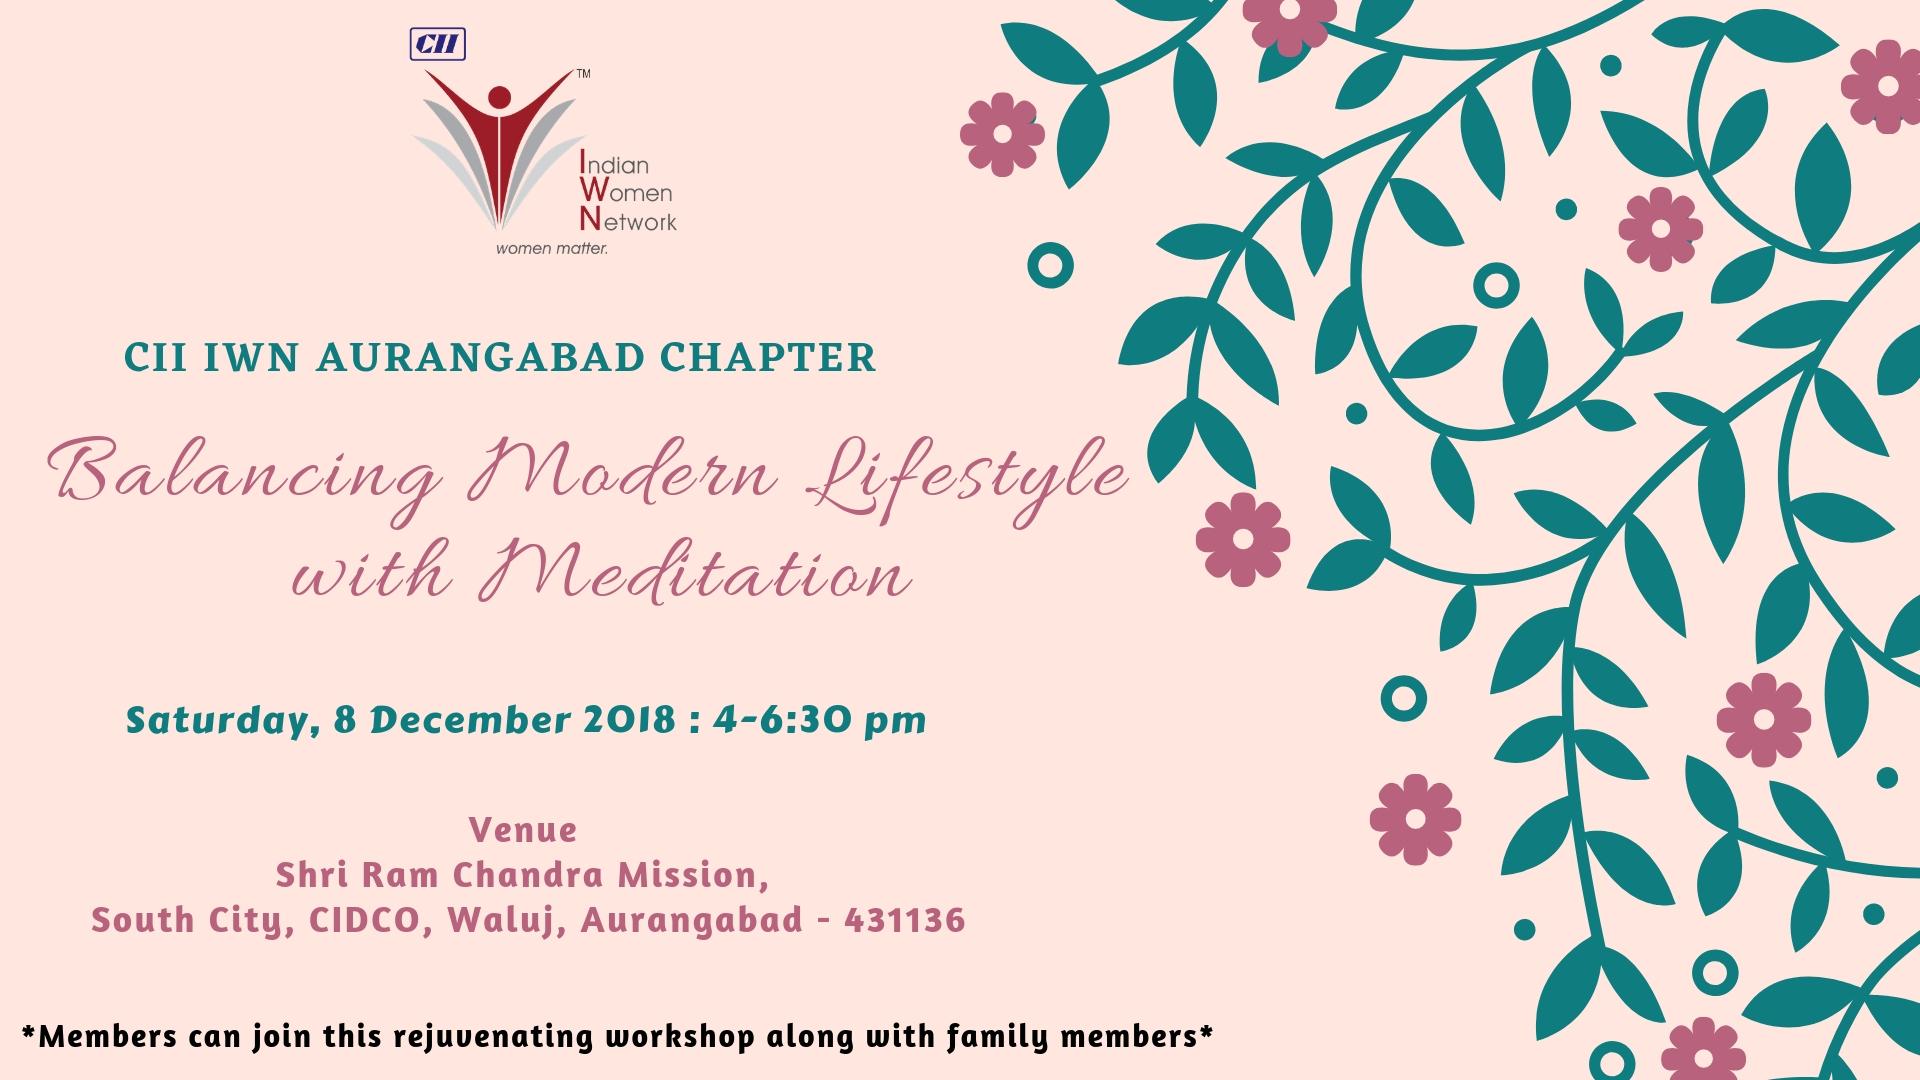 CII IWN Aurangabad Chapter –  Workshop on Balancing Modern Lifestyle with Meditation